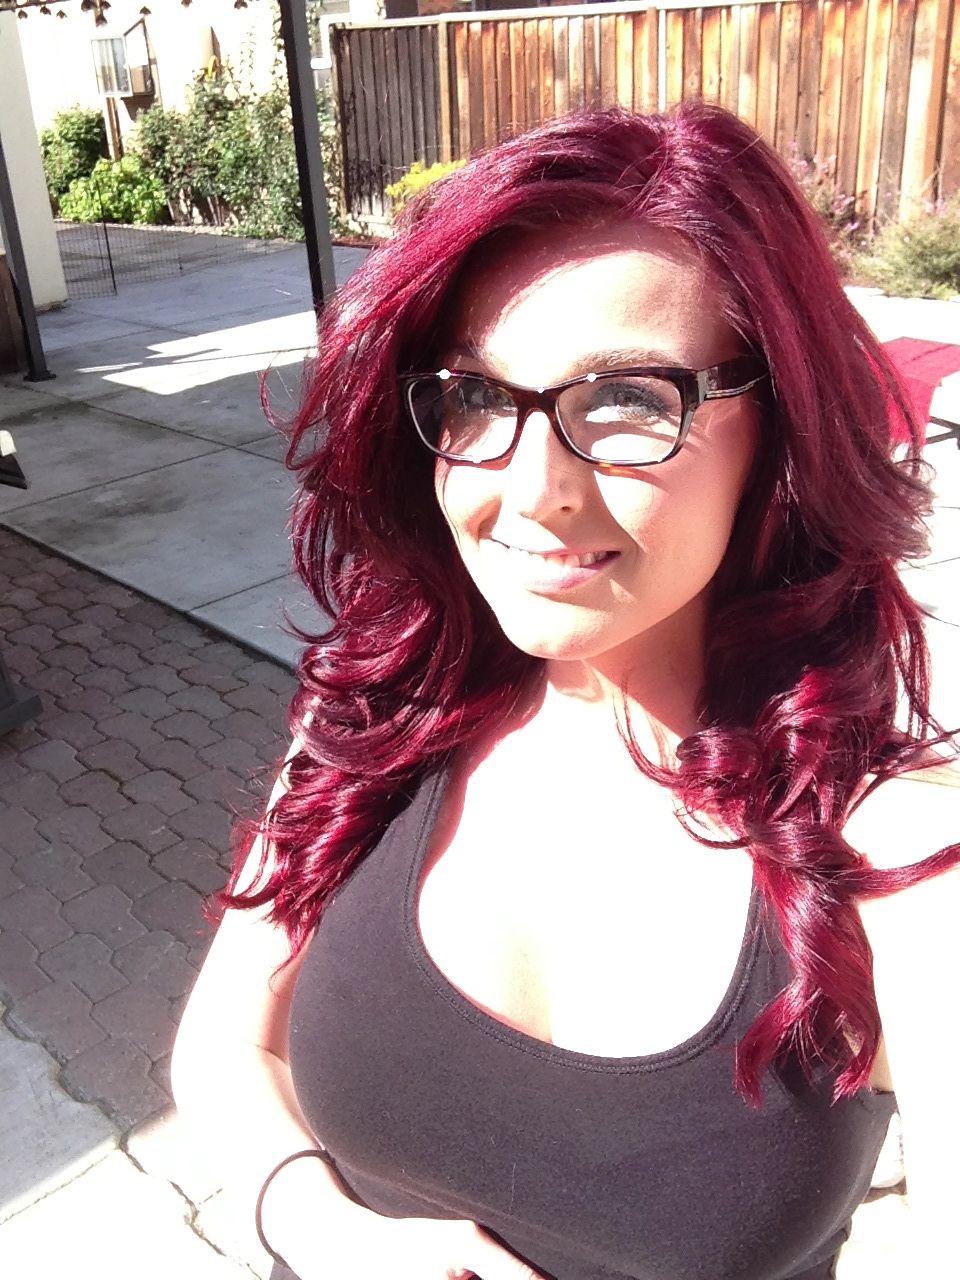 Pin By Susie Dent On Makeup Items Red Hair Woman Burgundy Hair Hair Affair